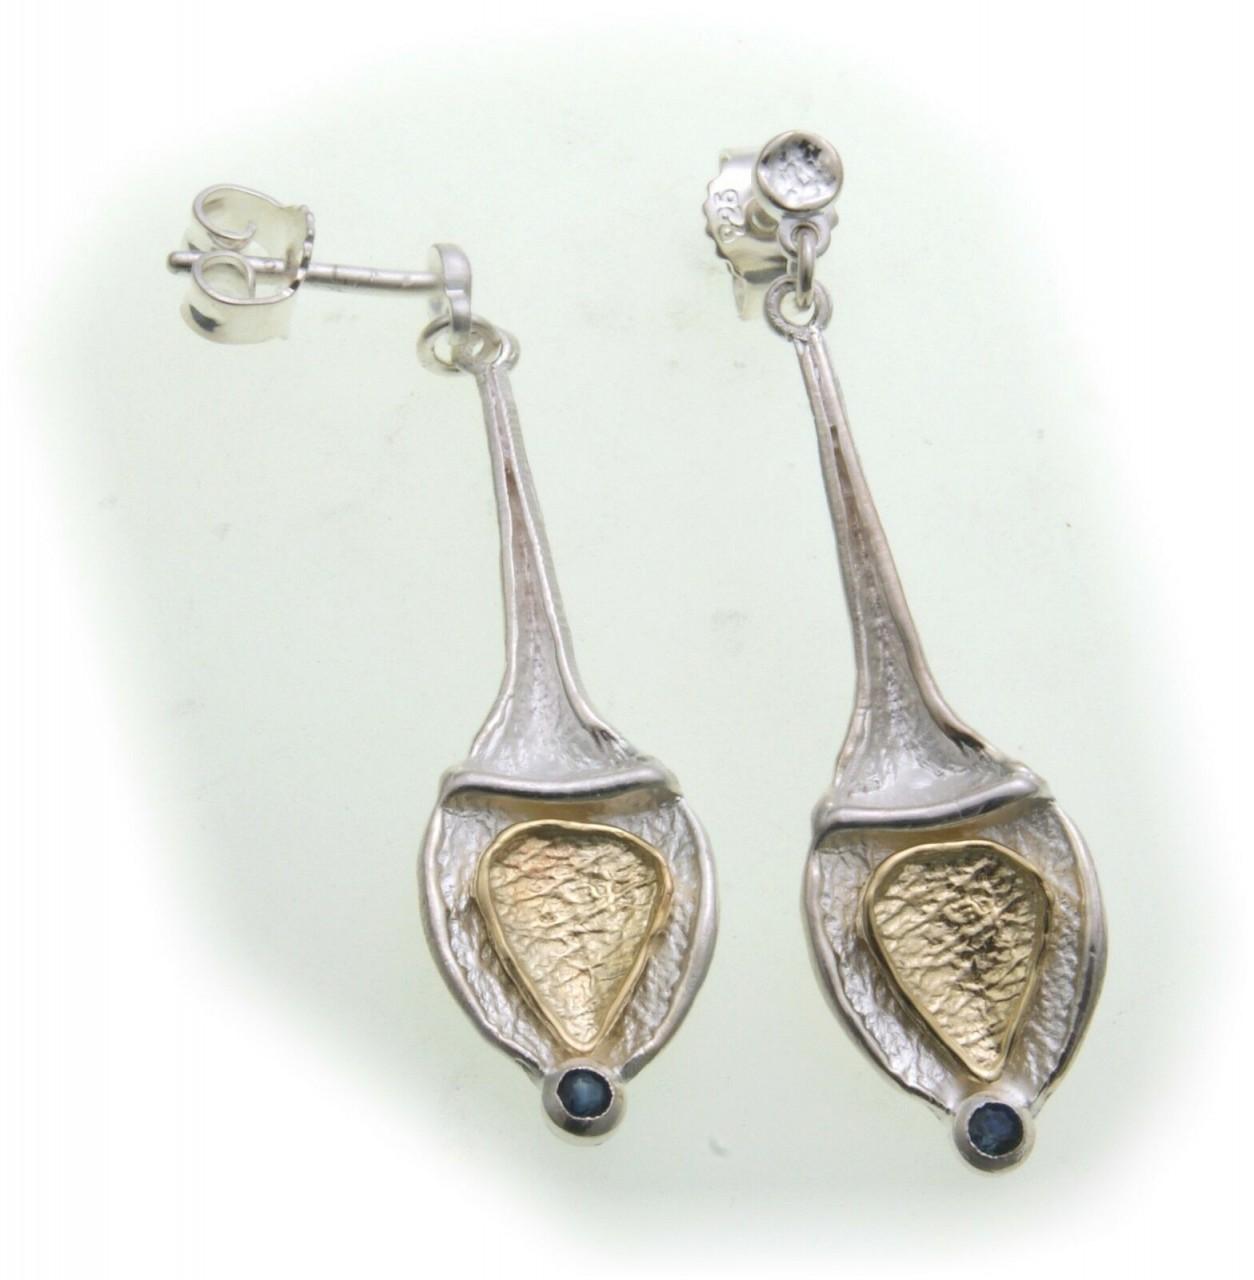 Ohrringe Hänger echt Sterlingsilber 925 Saphir Bicolor Ohrhänger Sterlingsilber